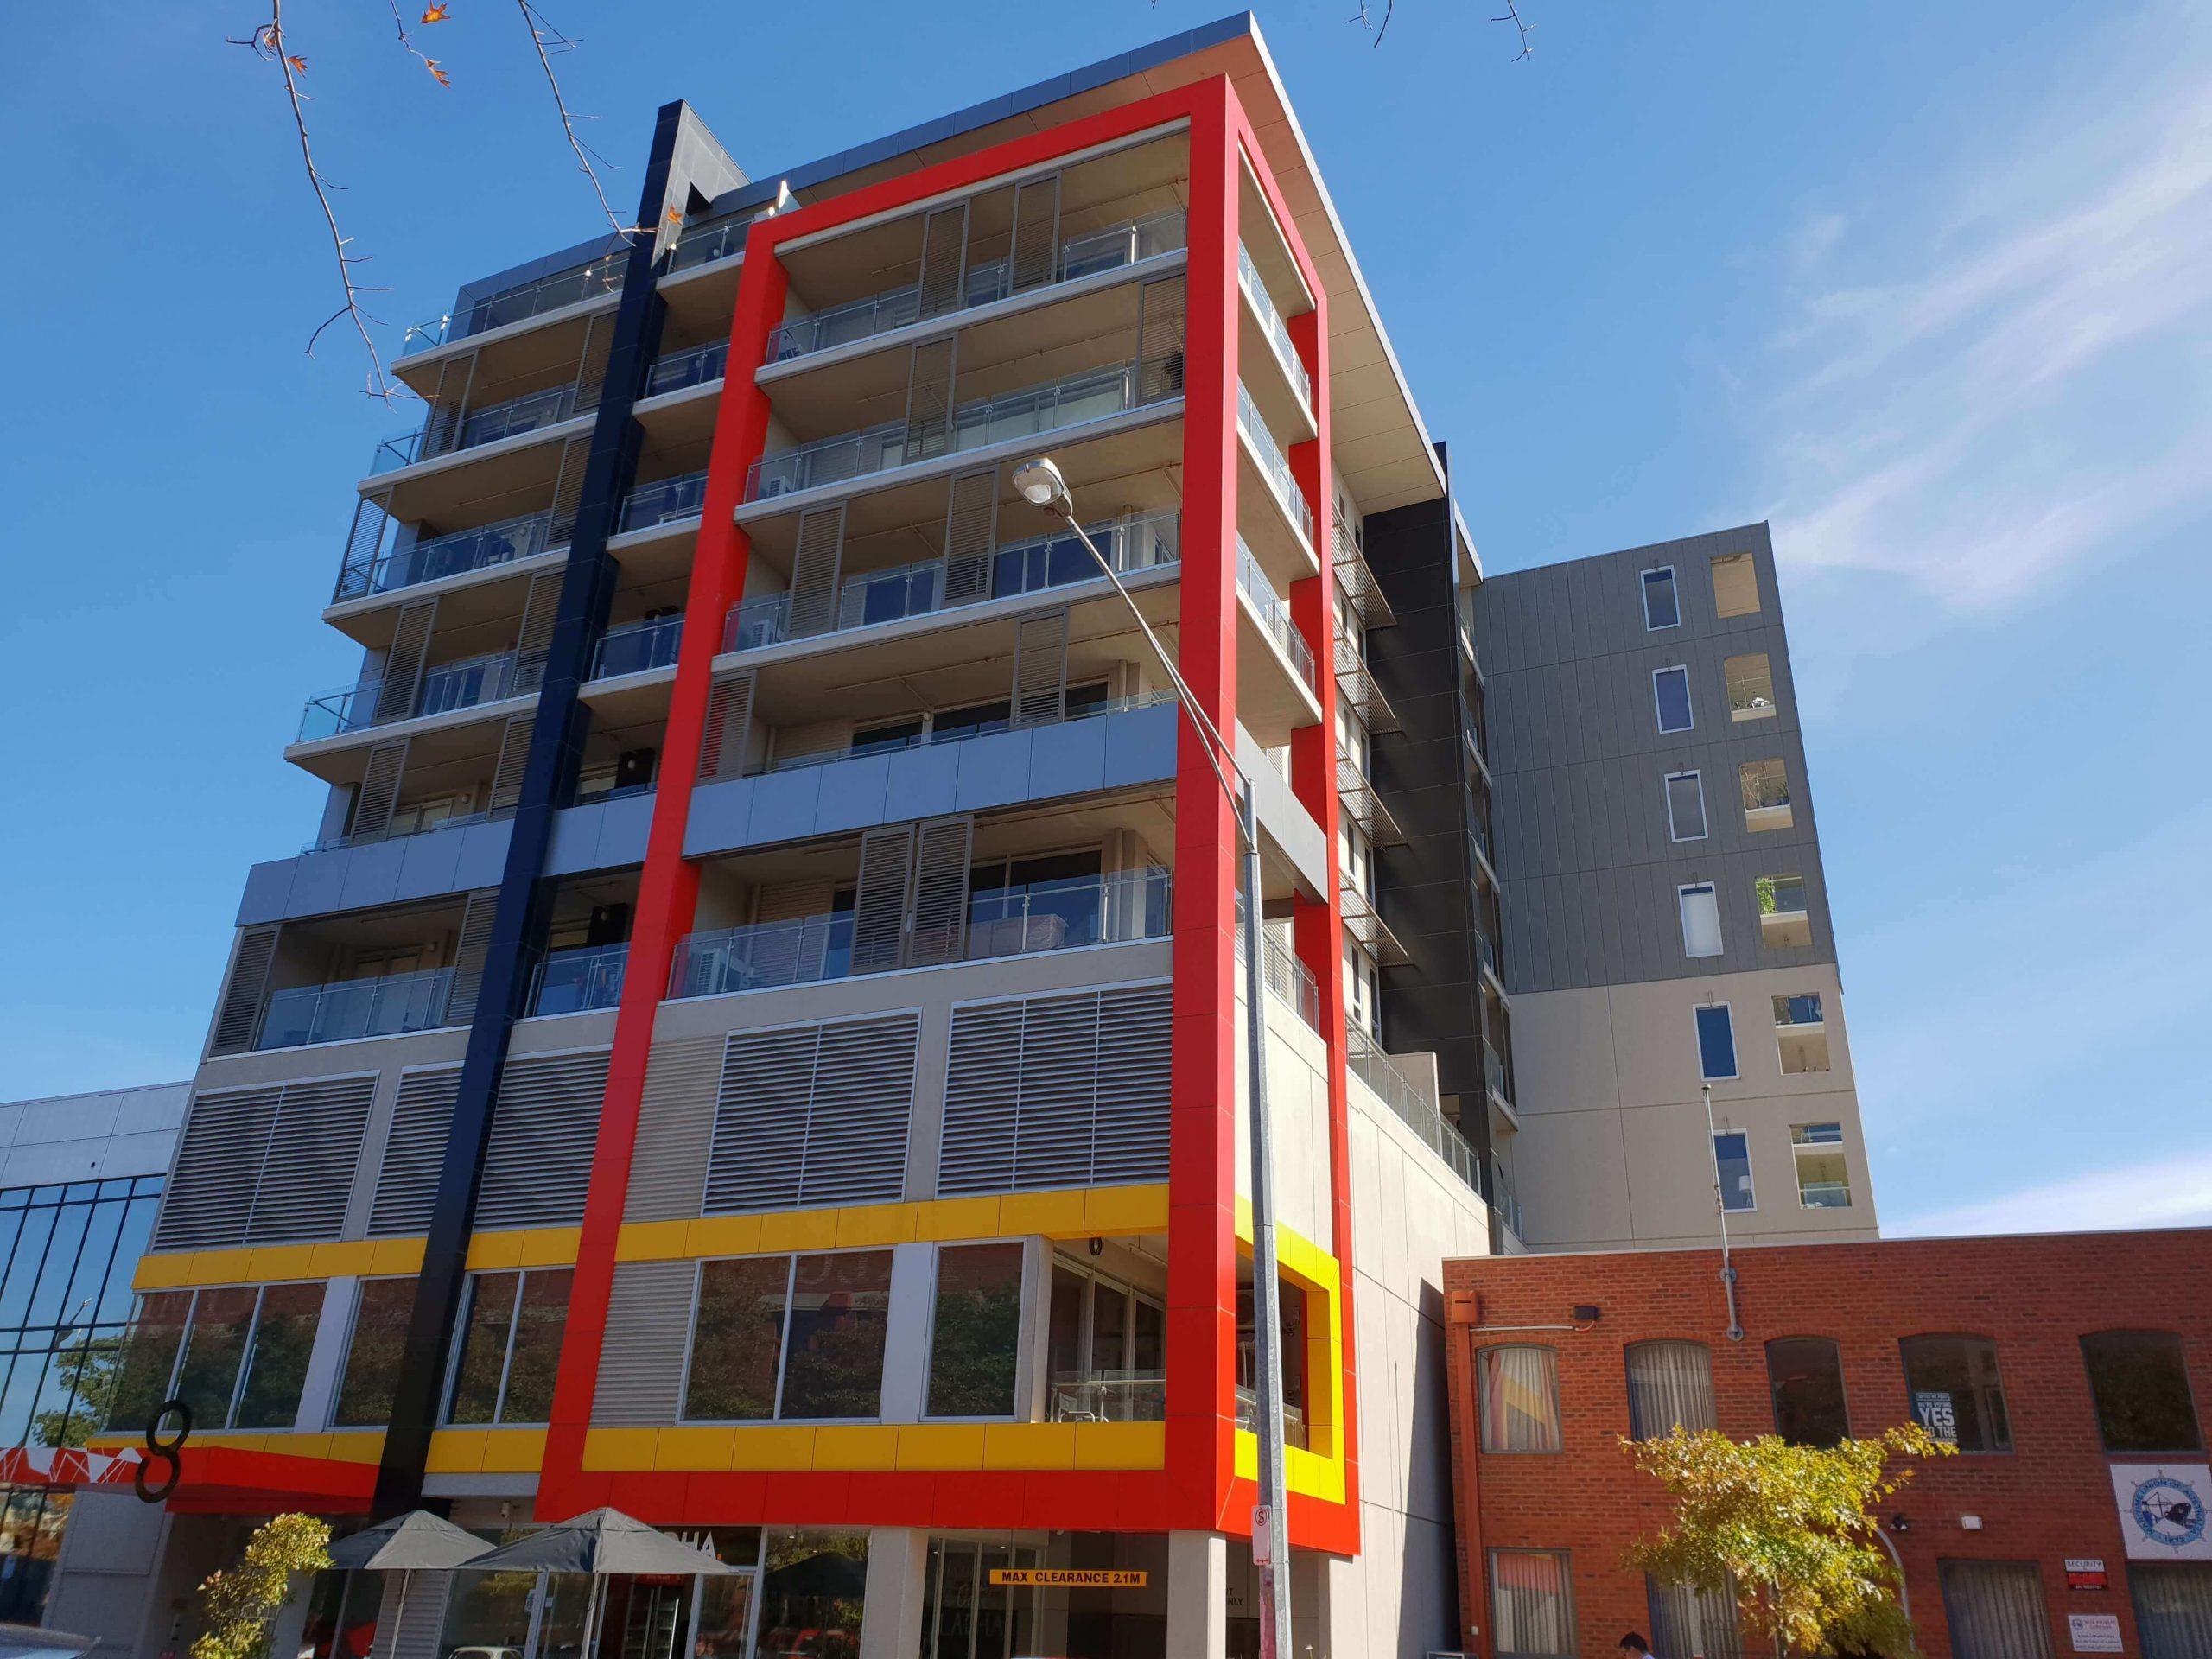 Gheringhap-St-Apartments-Geelong